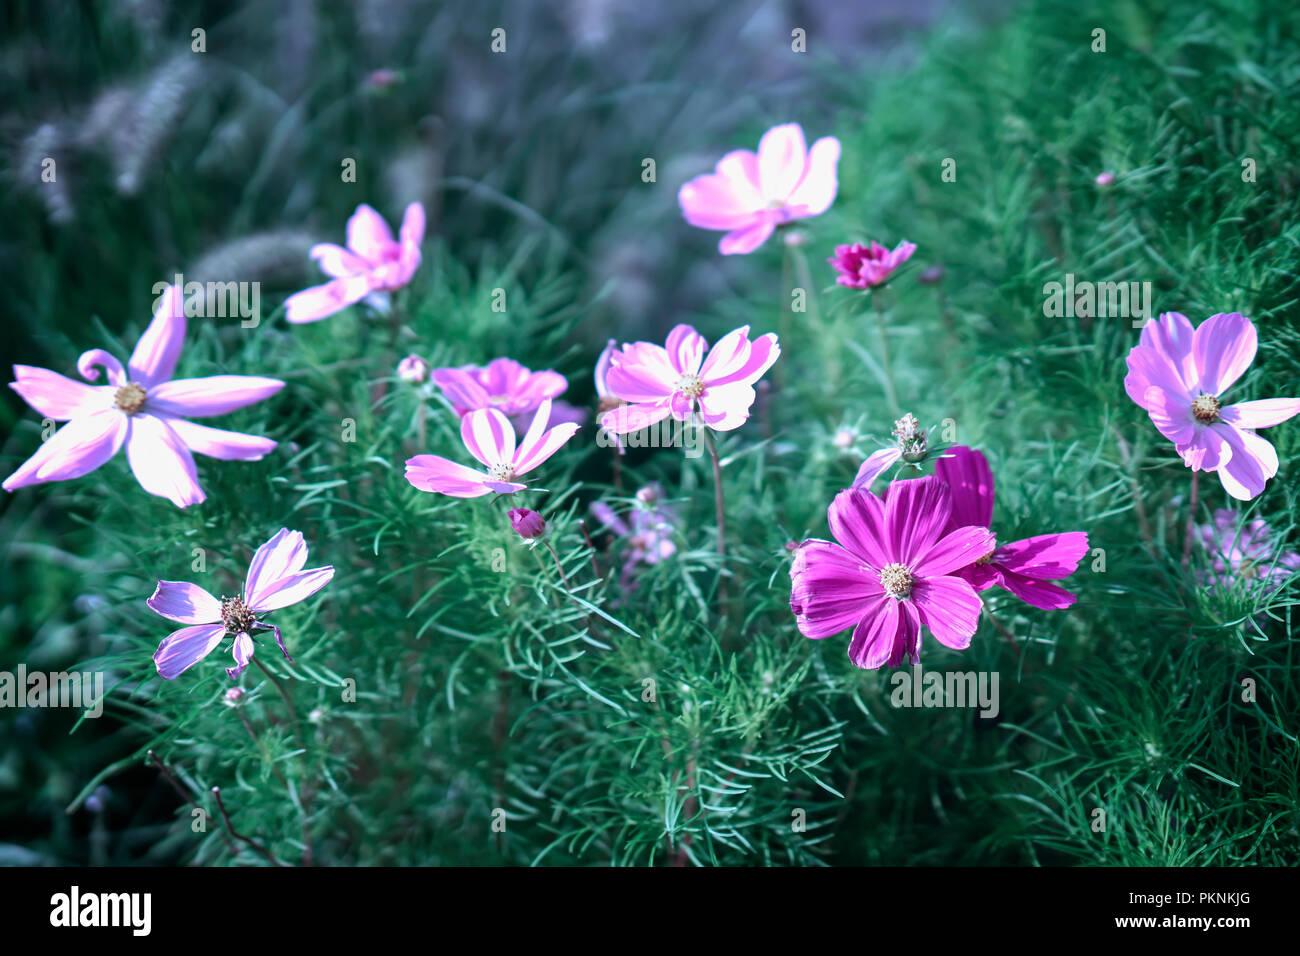 Cosmos Flowers Elegant Plants With Pink Purple Flowers Summer